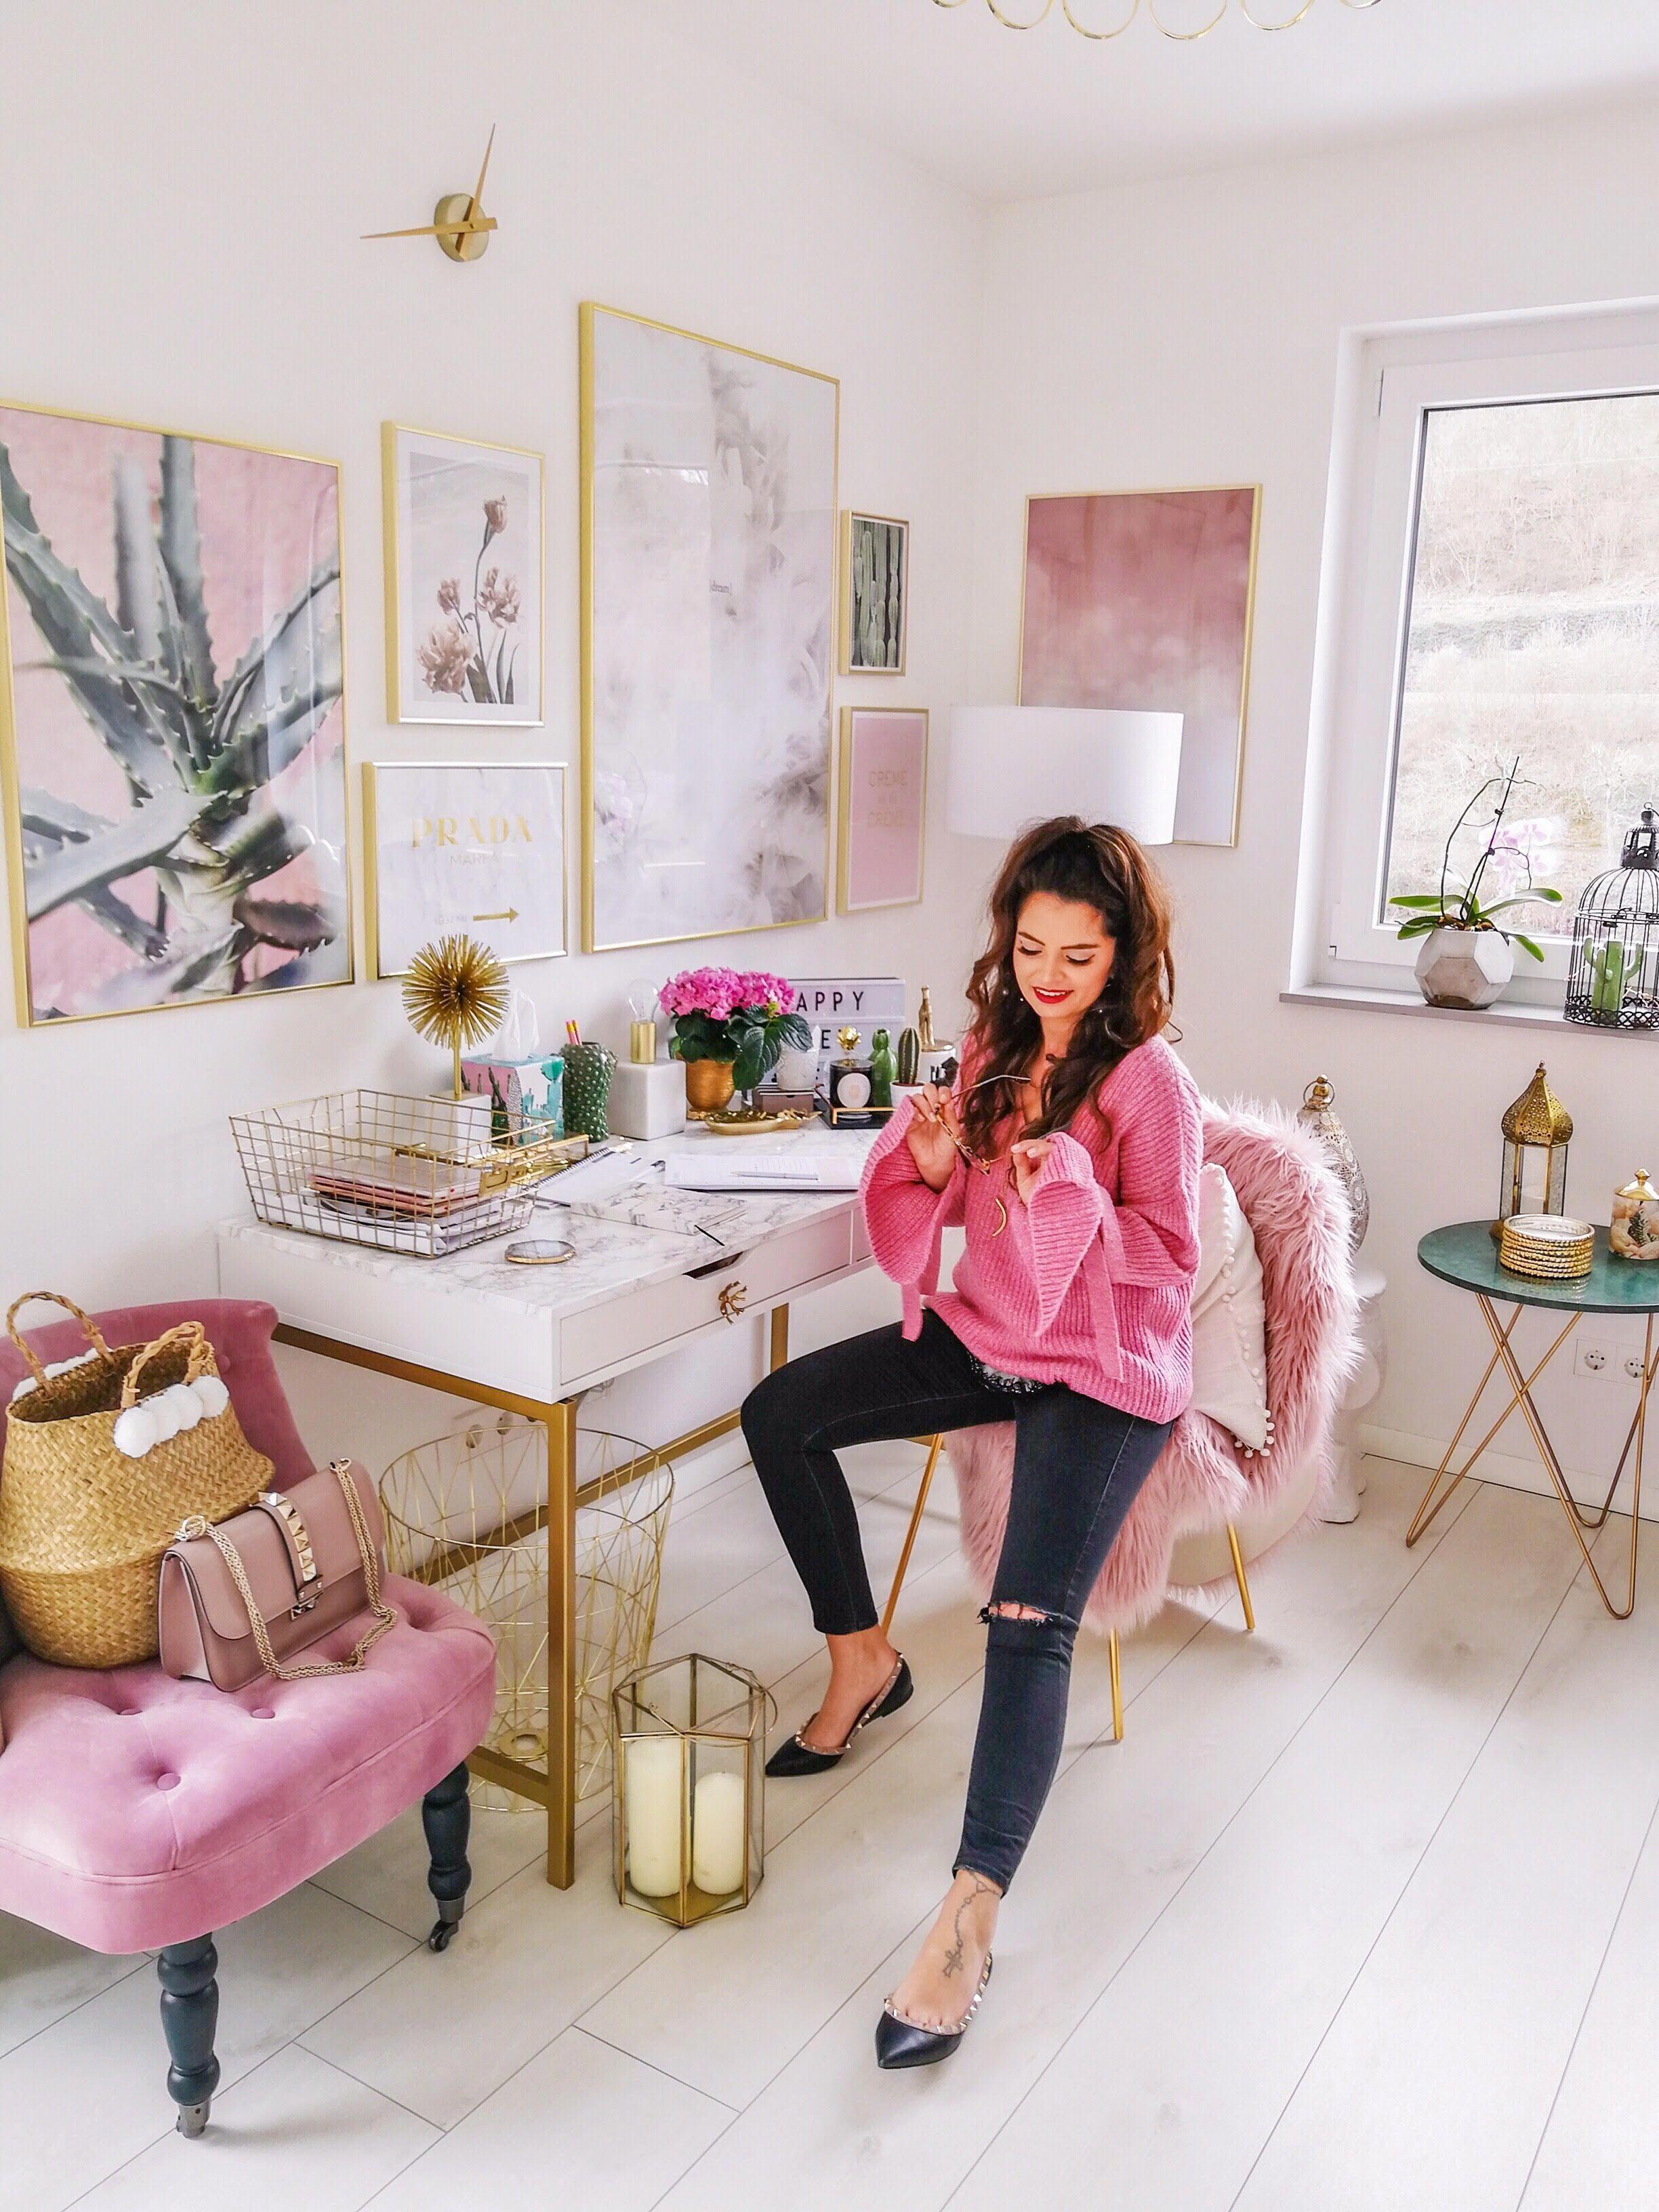 Home Desk Ideas Home Office Style Ideas Creative Home Decor 20190120 Home Office Decor Home Office Design Office Design